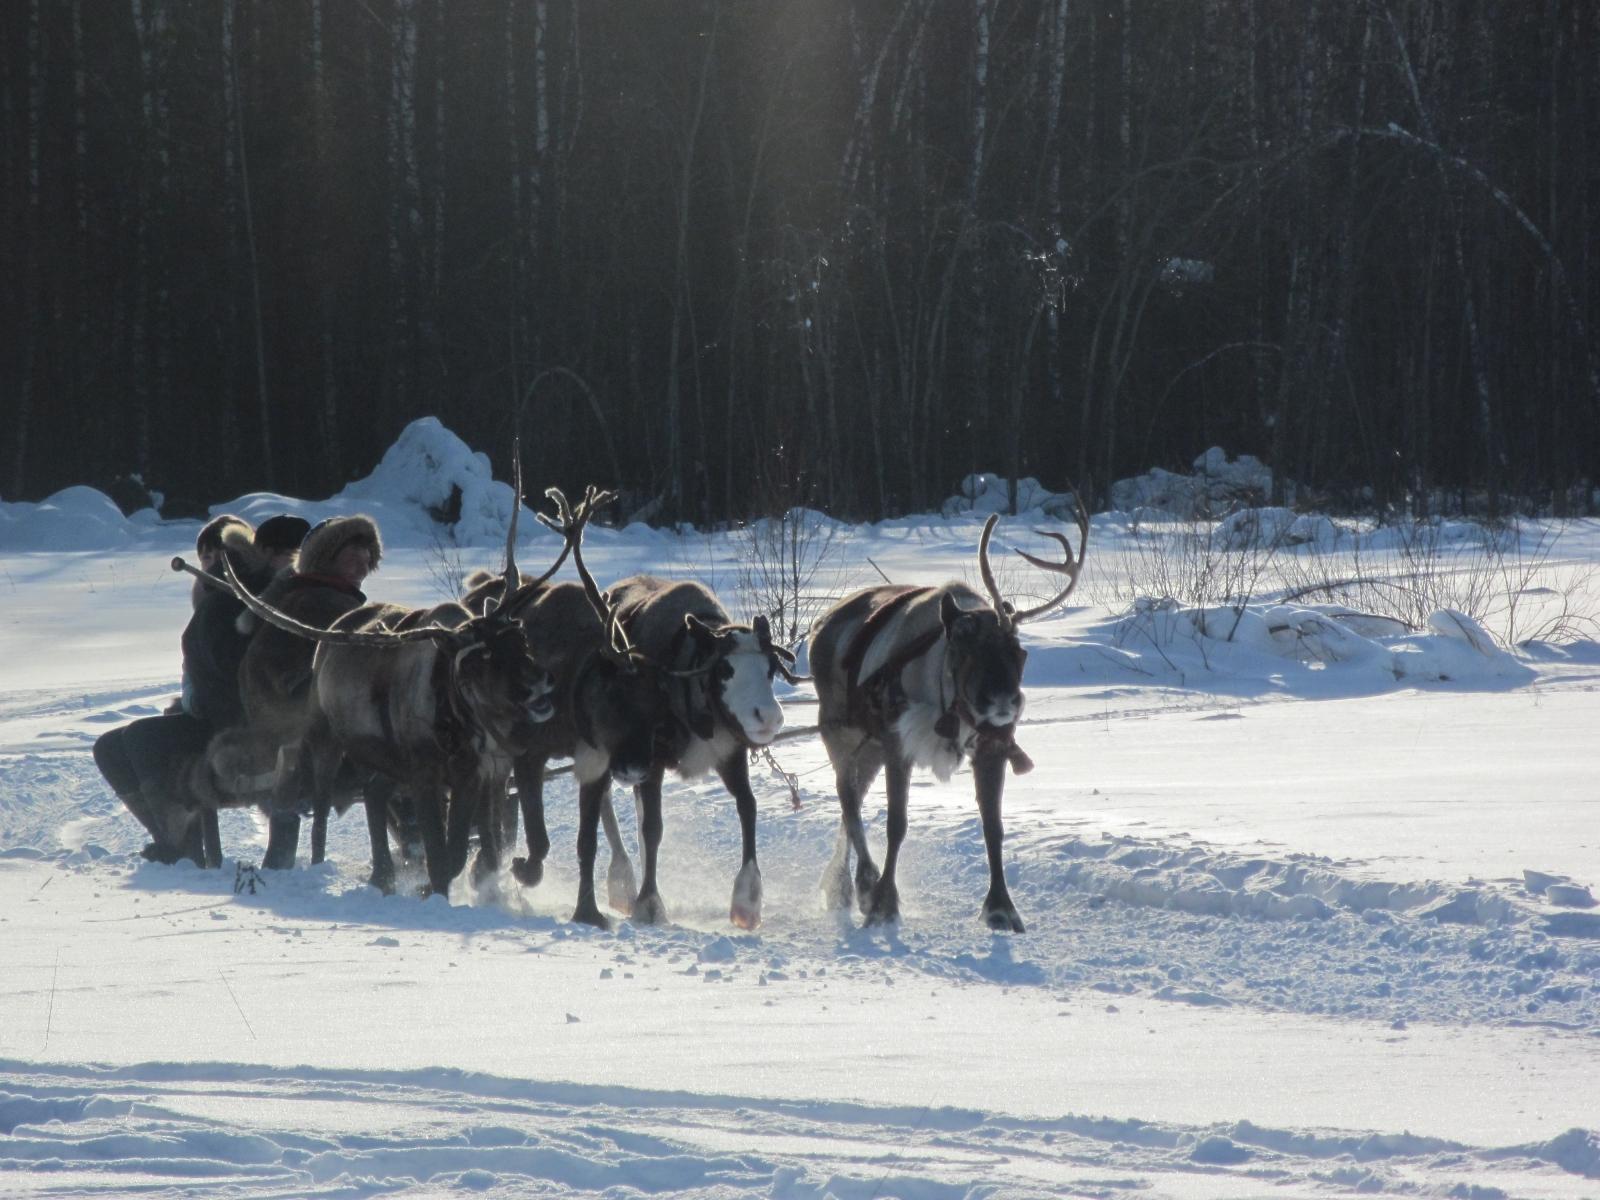 Reindeer in siberia police russia